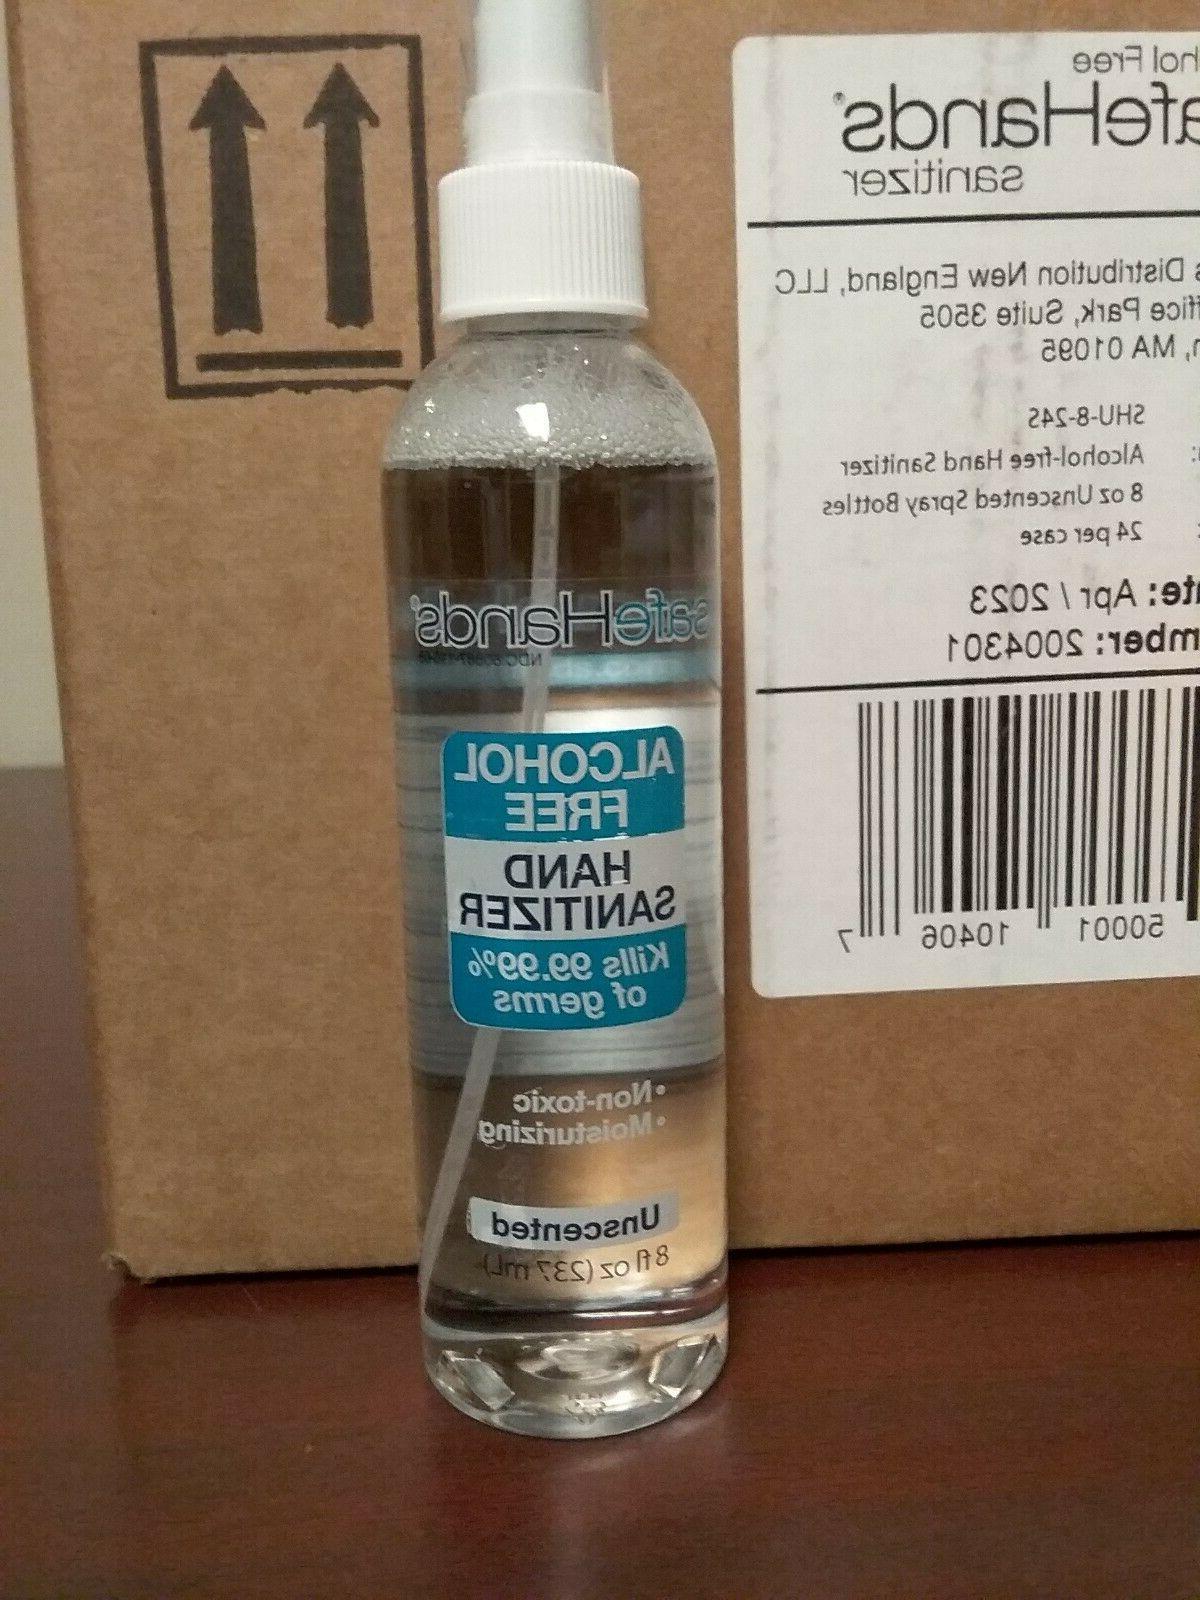 alcohol free spray hand sanitizer spray 8oz